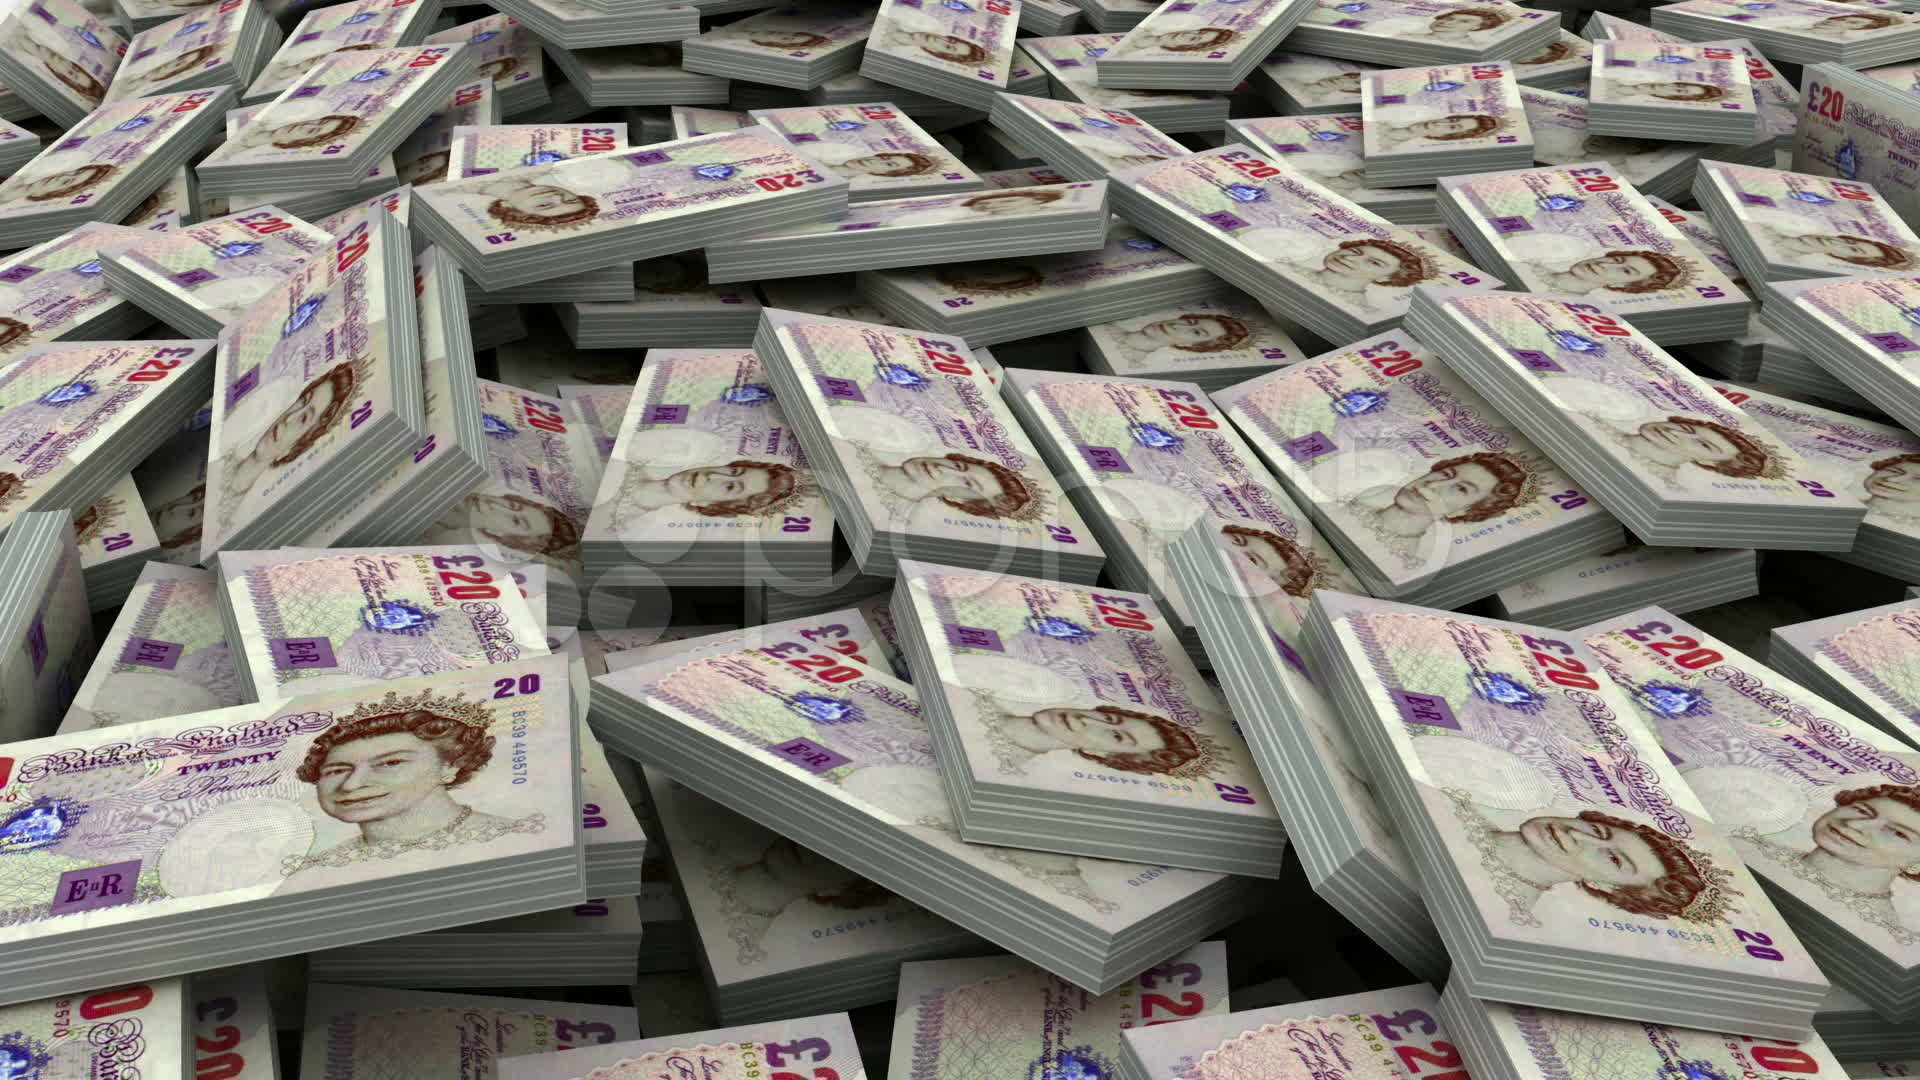 Dva ekspressa iz odinakovyh sobytij prinesli betteru 54 000 funtov